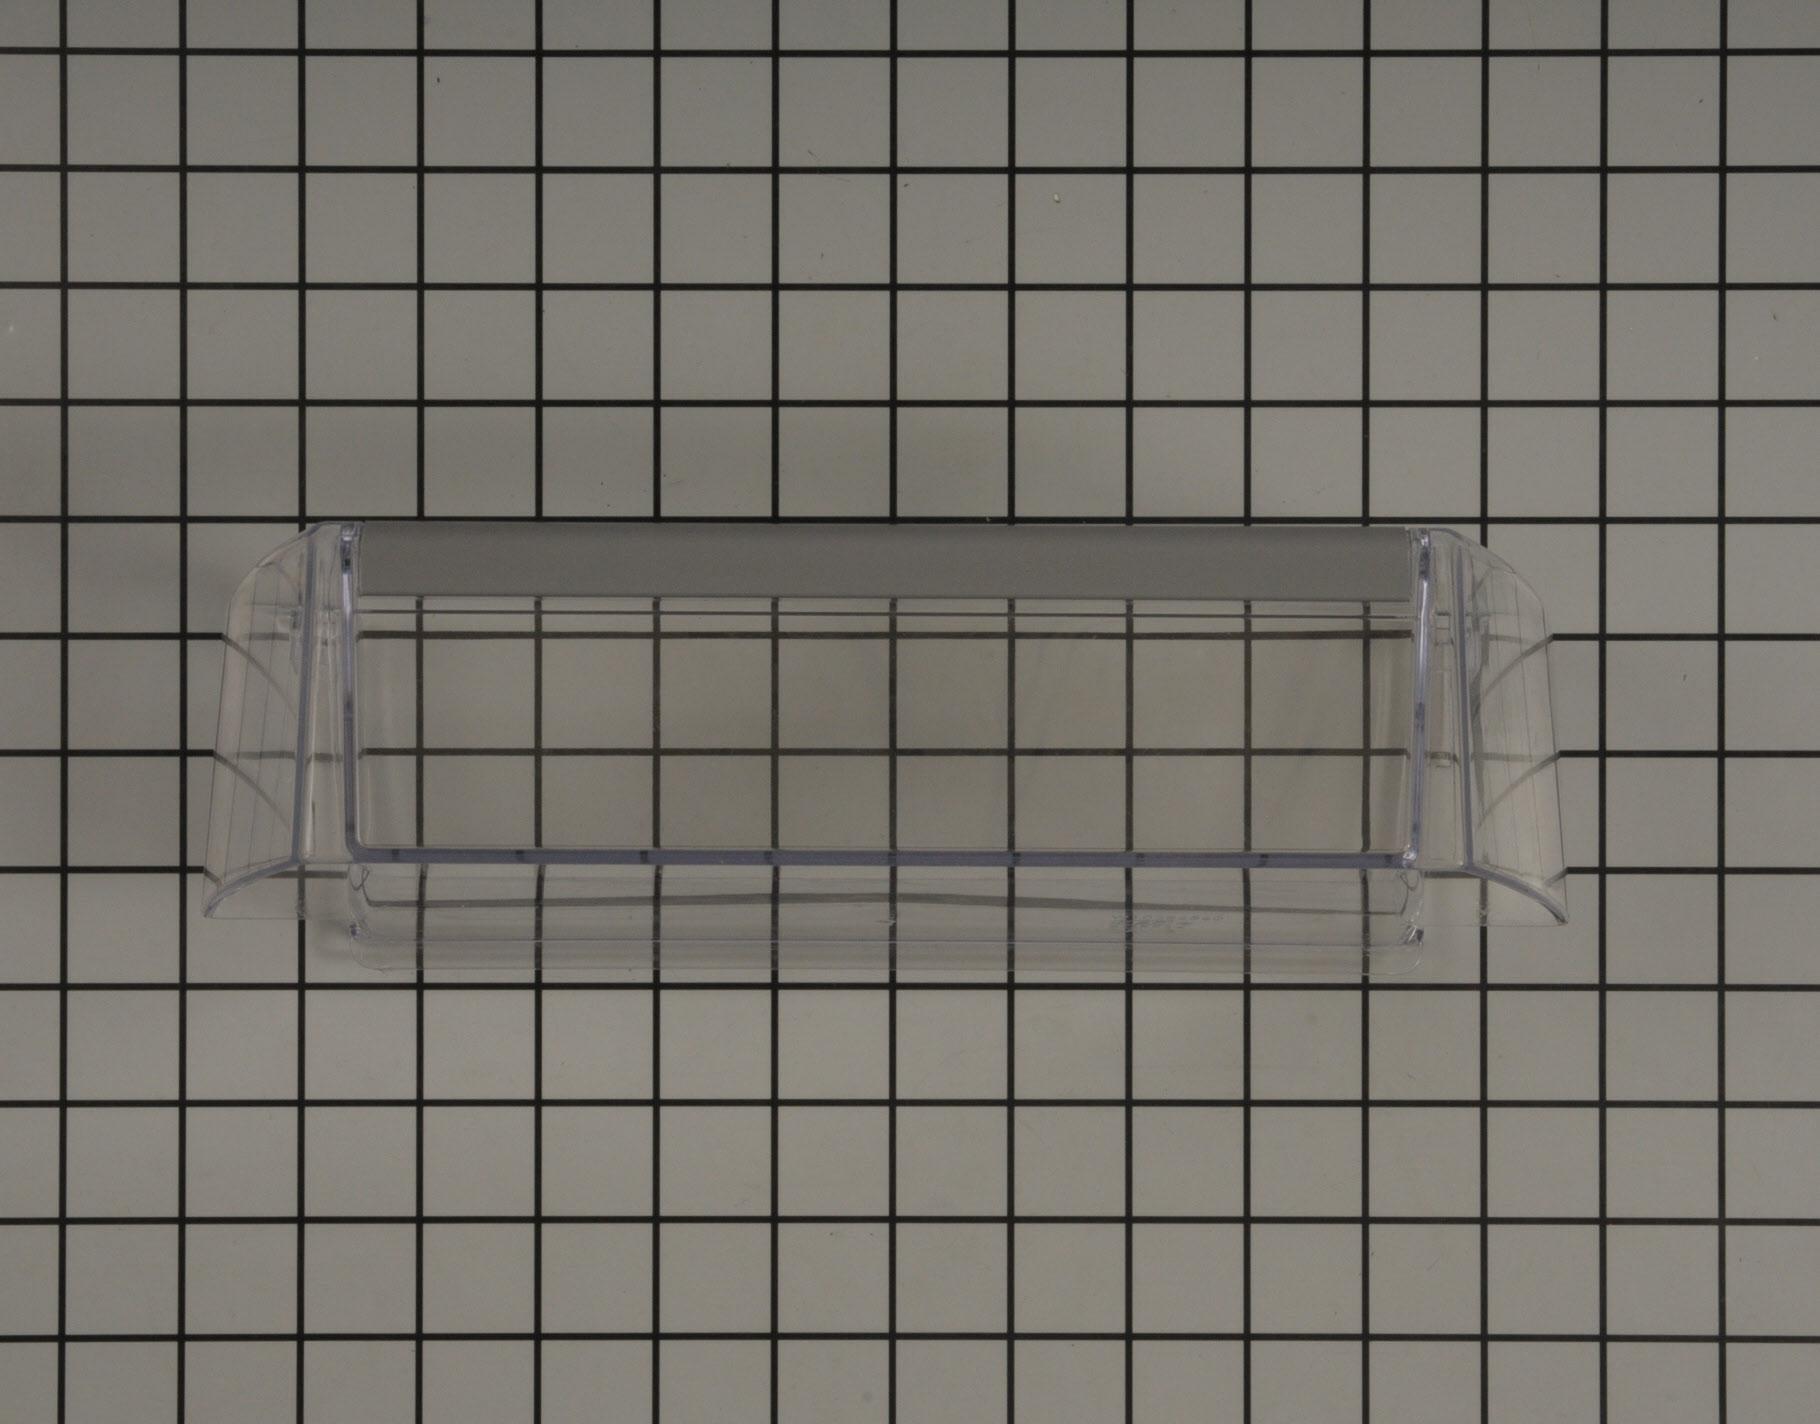 Maytag Refrigerator Part # W10646629 - Door Shelf Bin